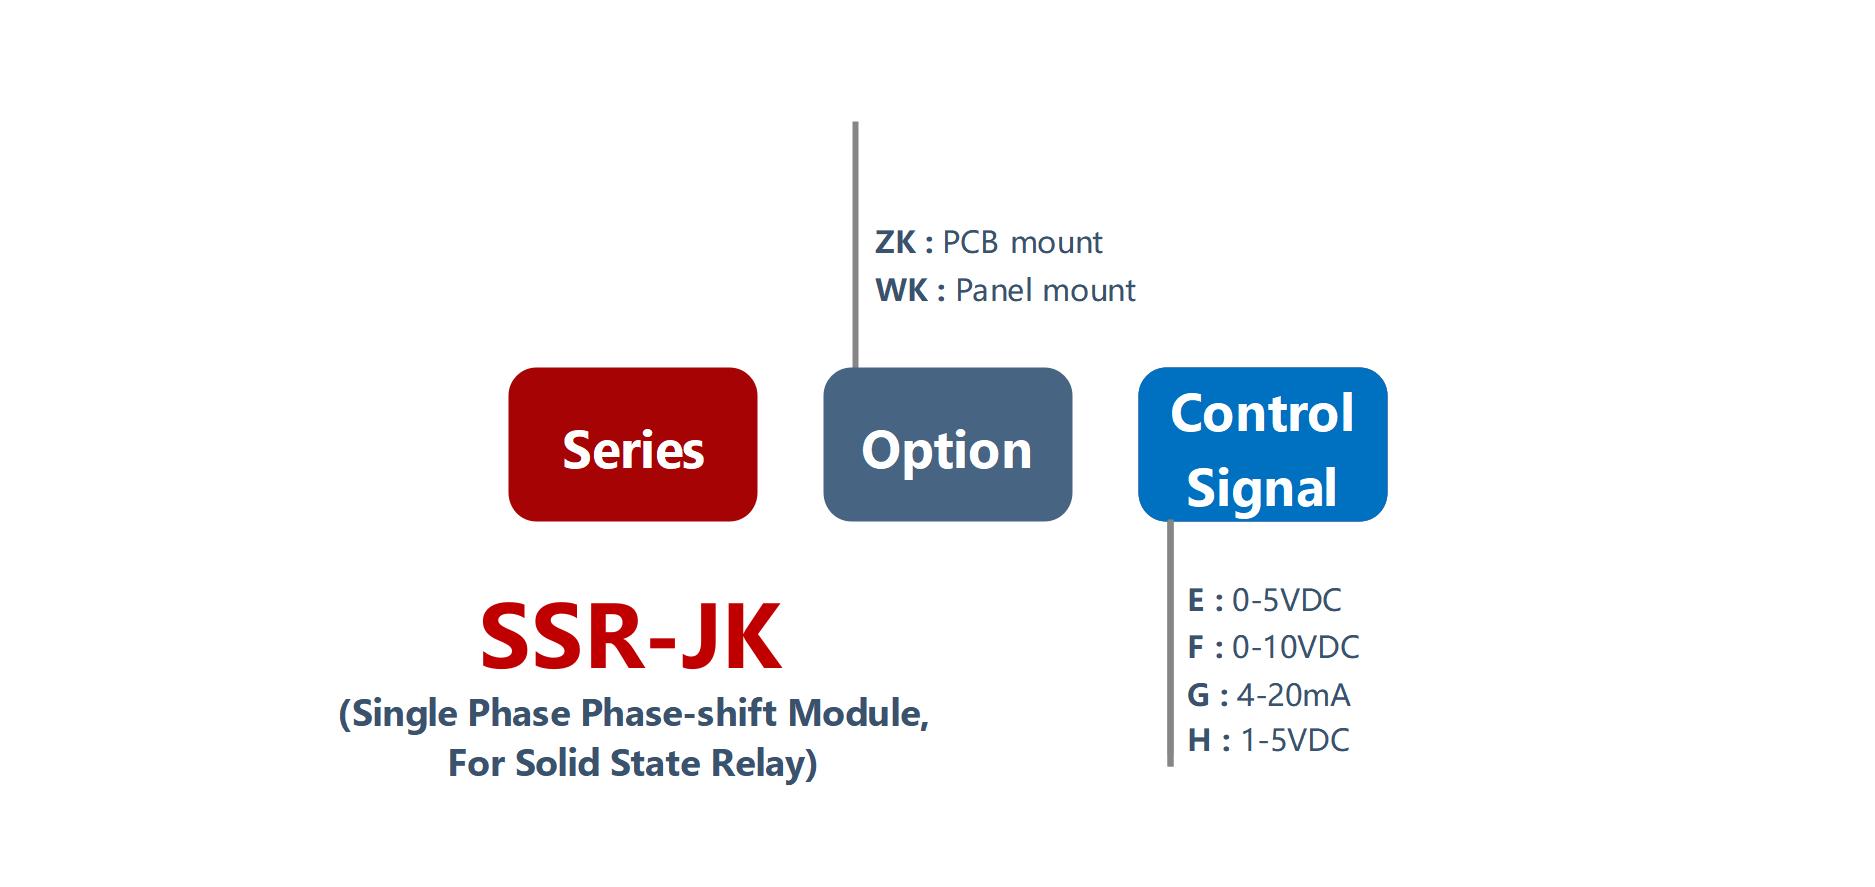 How to order SSR-JK Series Voltage Power Regulator